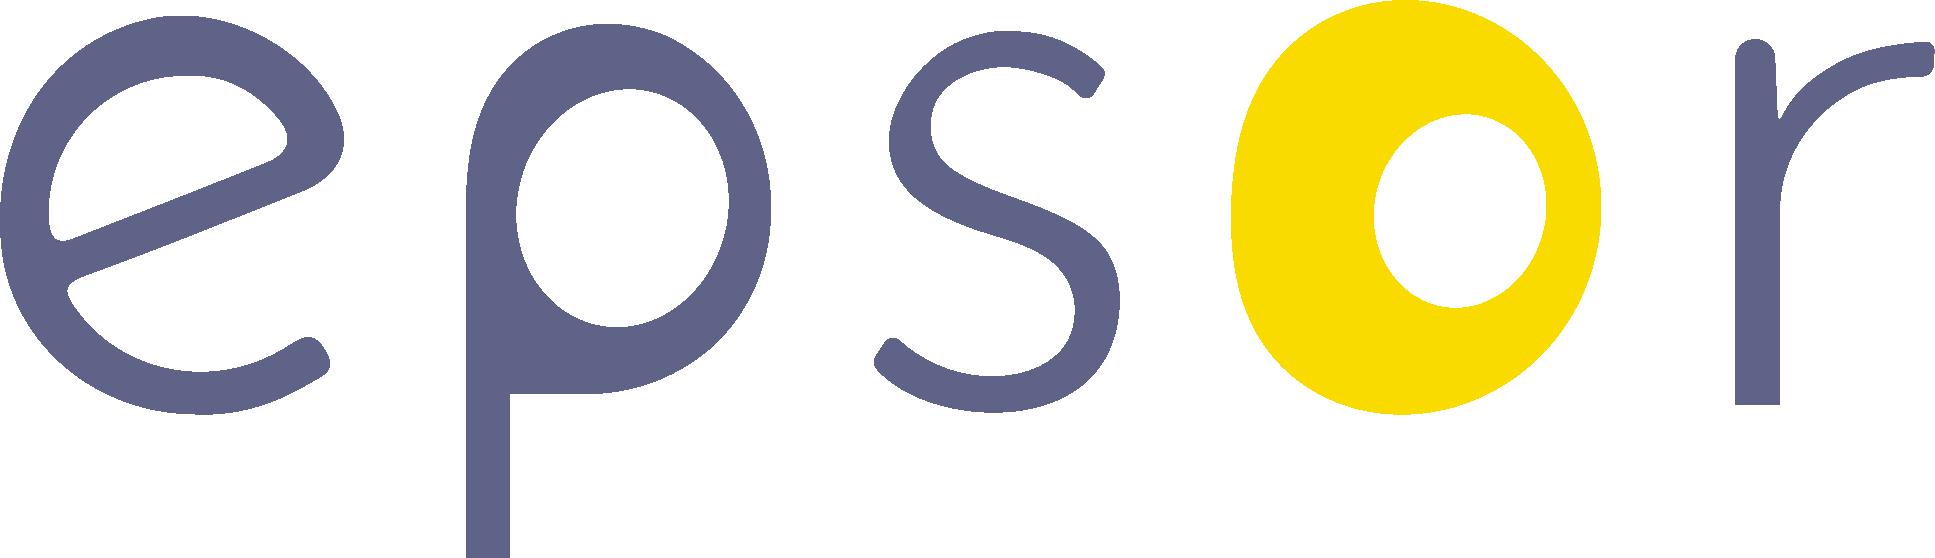 logo_epsor-3